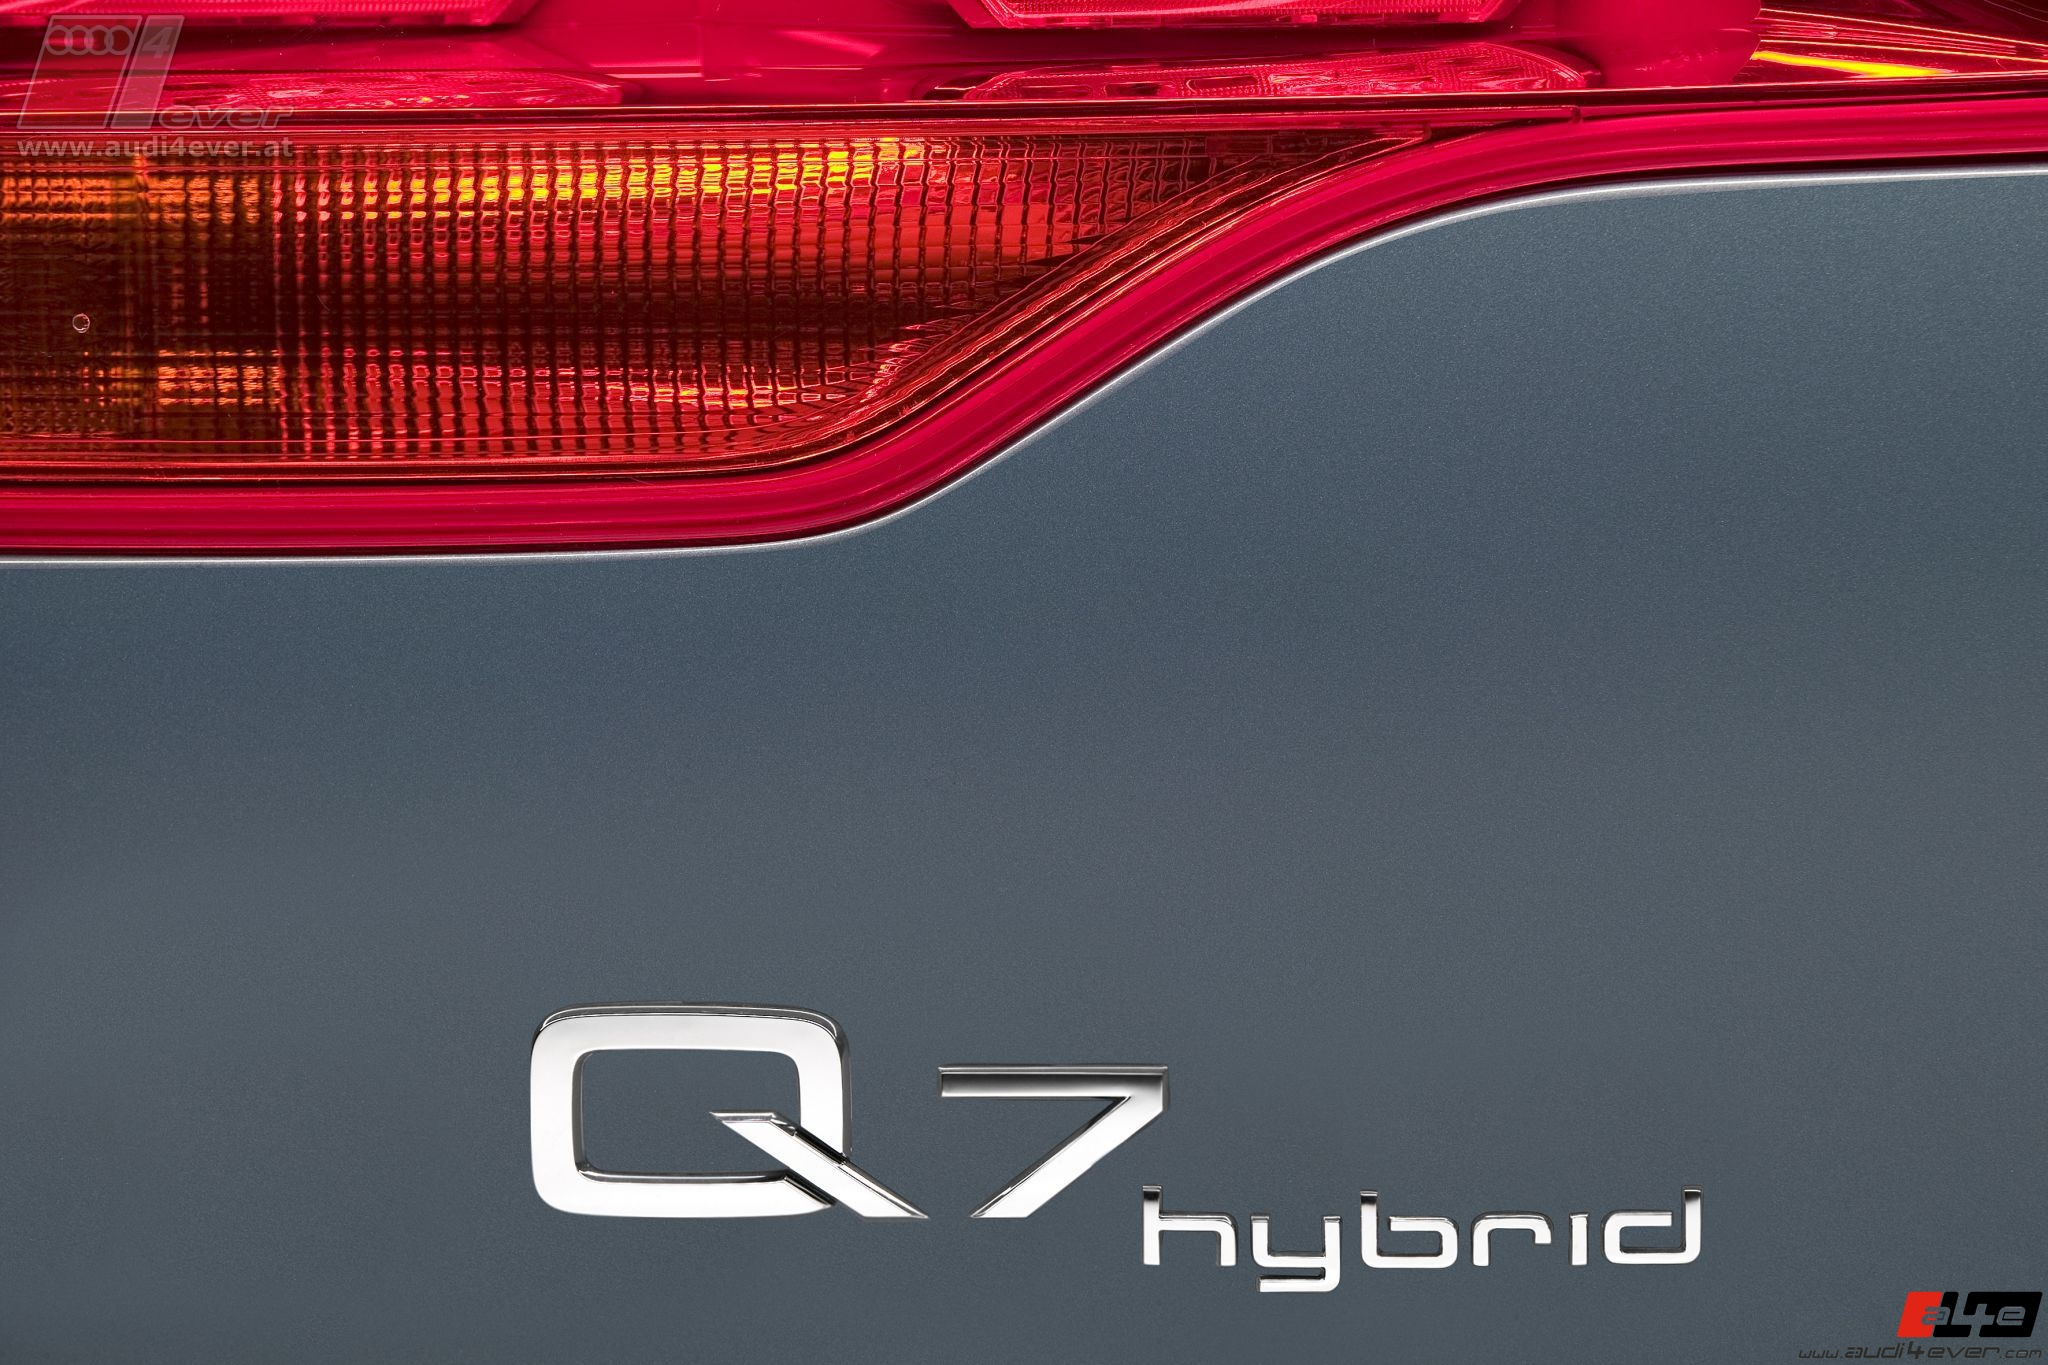 A4e Gallery Audi Concept Cars Audi Q7 Hybrid